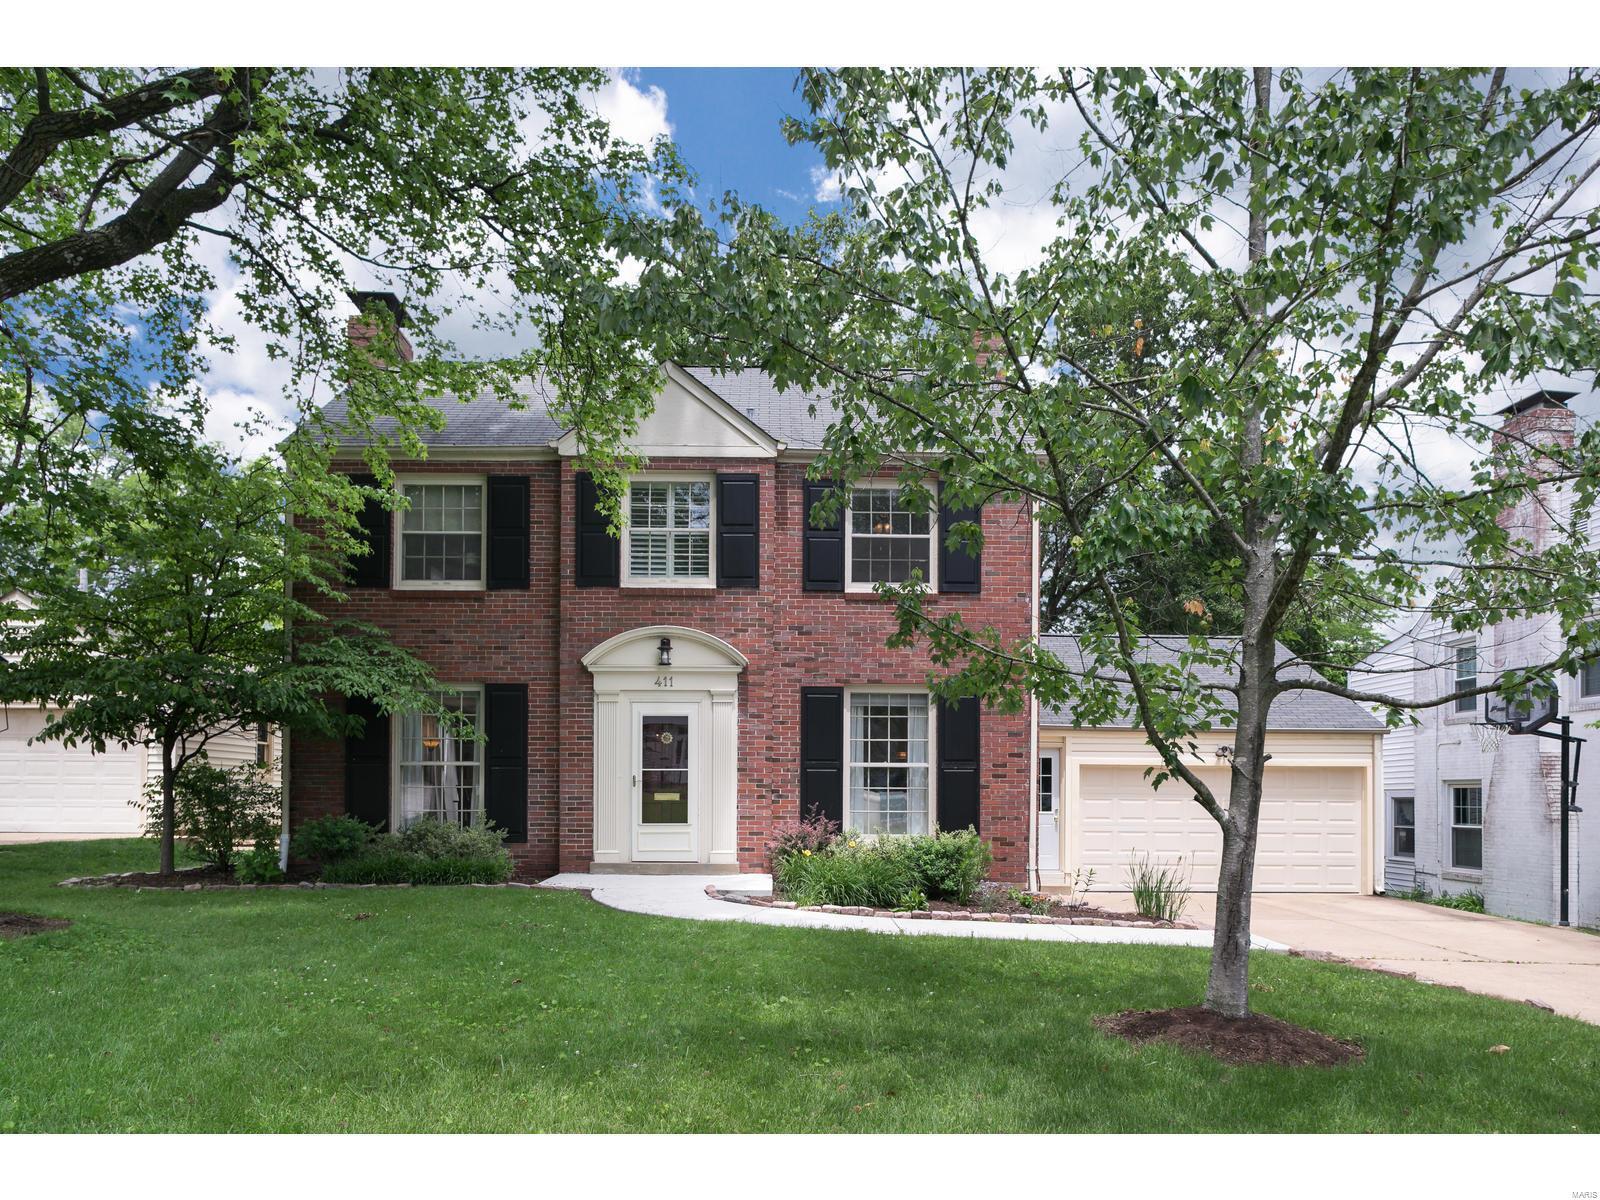 411 Fairwood Lane, Kirkwood, MO 63122